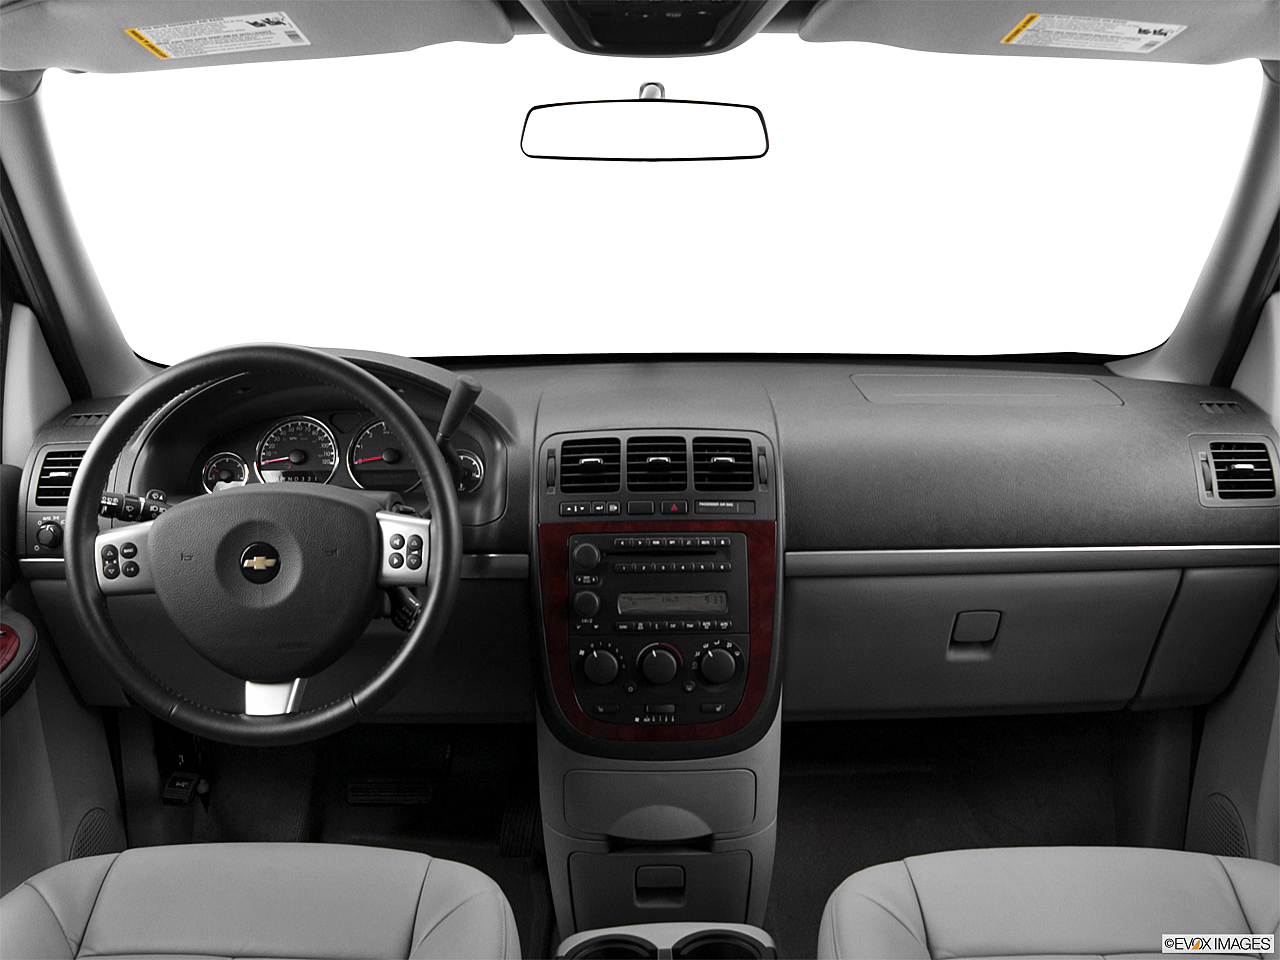 Chevrolet Uplander Interior Parts